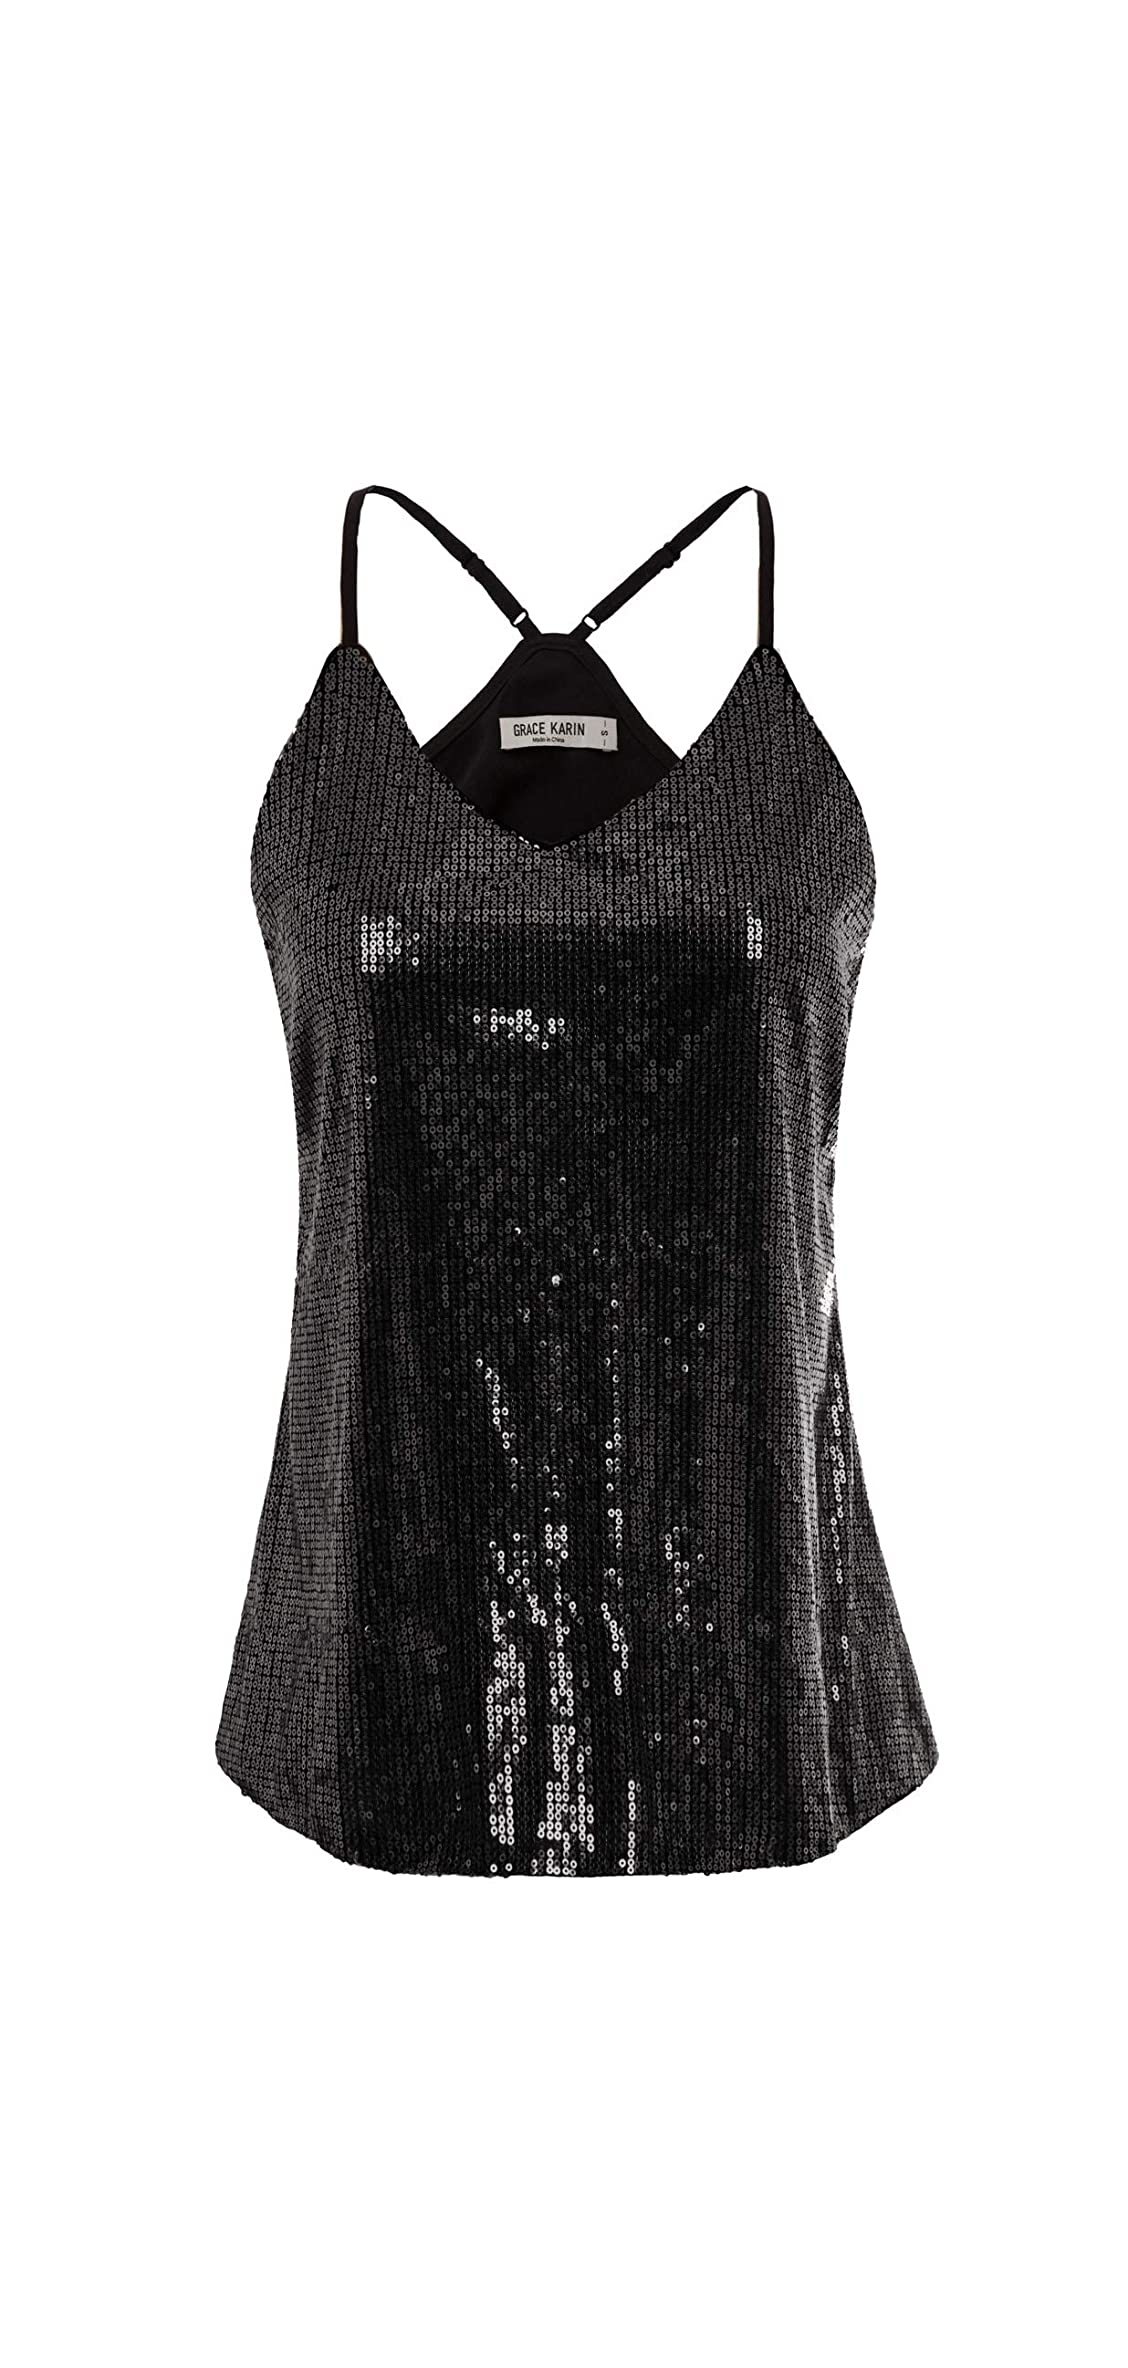 Women's Sleeveless Sparkle Shimmer Camisole Vest